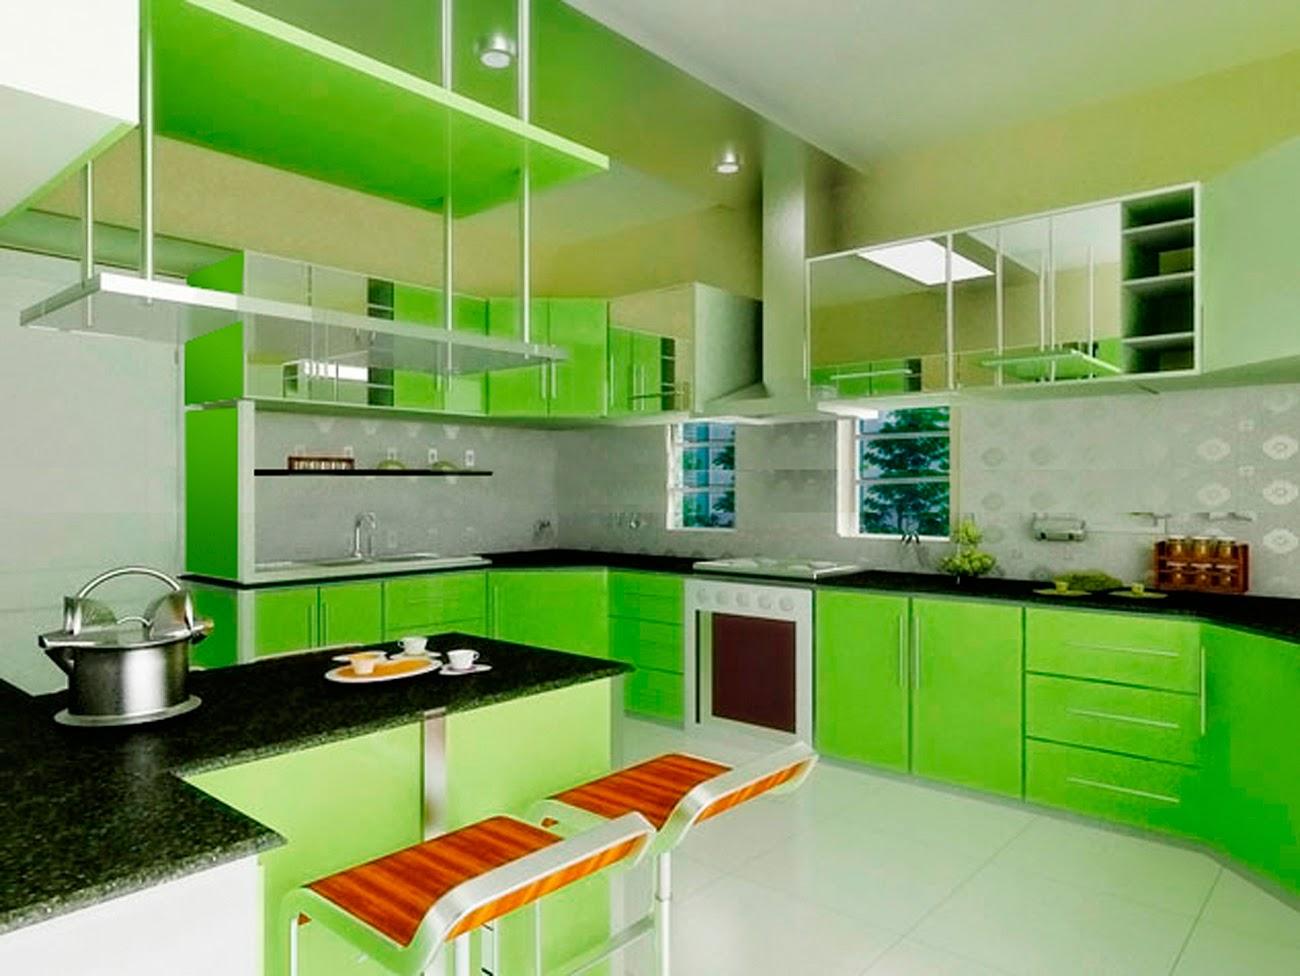 Warna cat dapur hijau muda